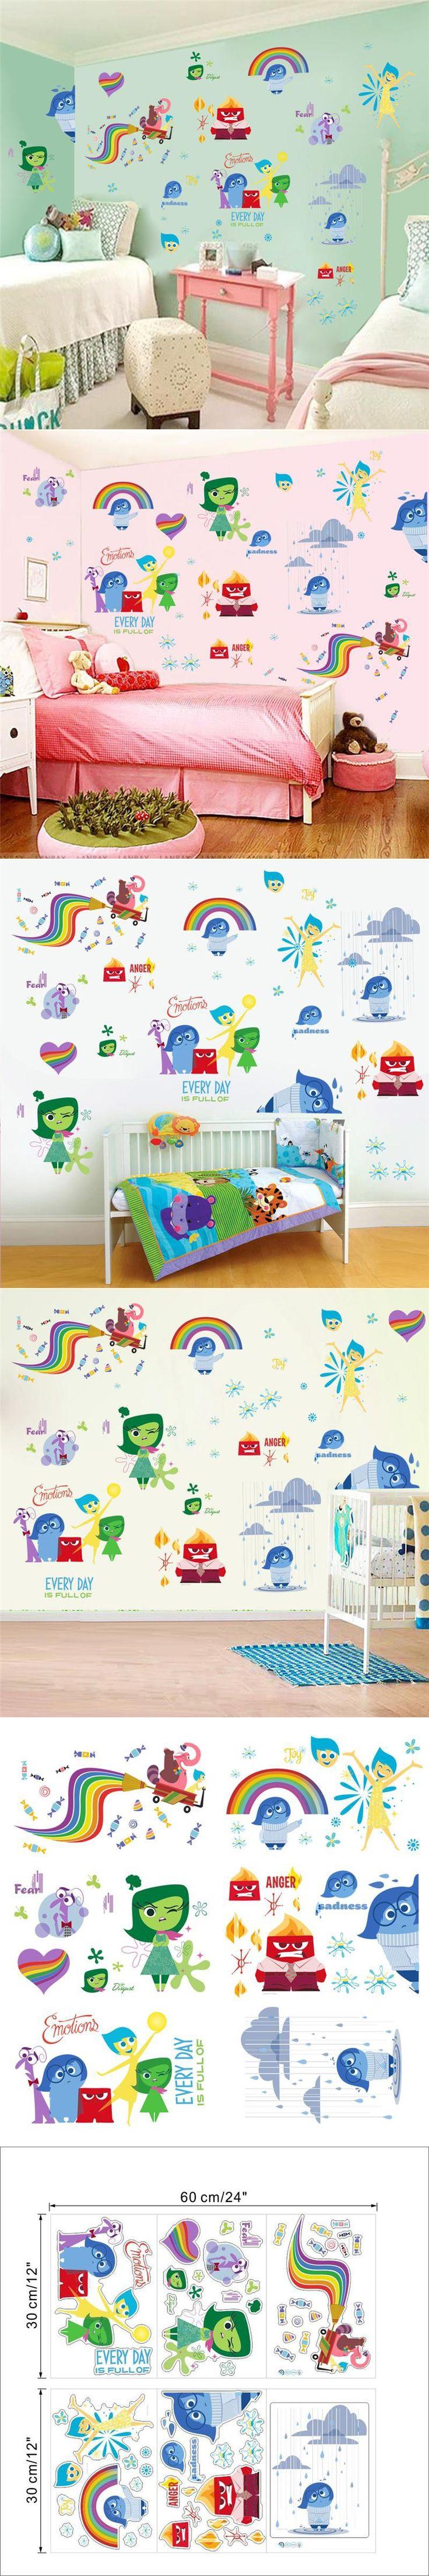 IO007& Mind Wars joy sadness anger disgust fear kids bedroom gift cartoon movie wall sticker diy children home removable decals